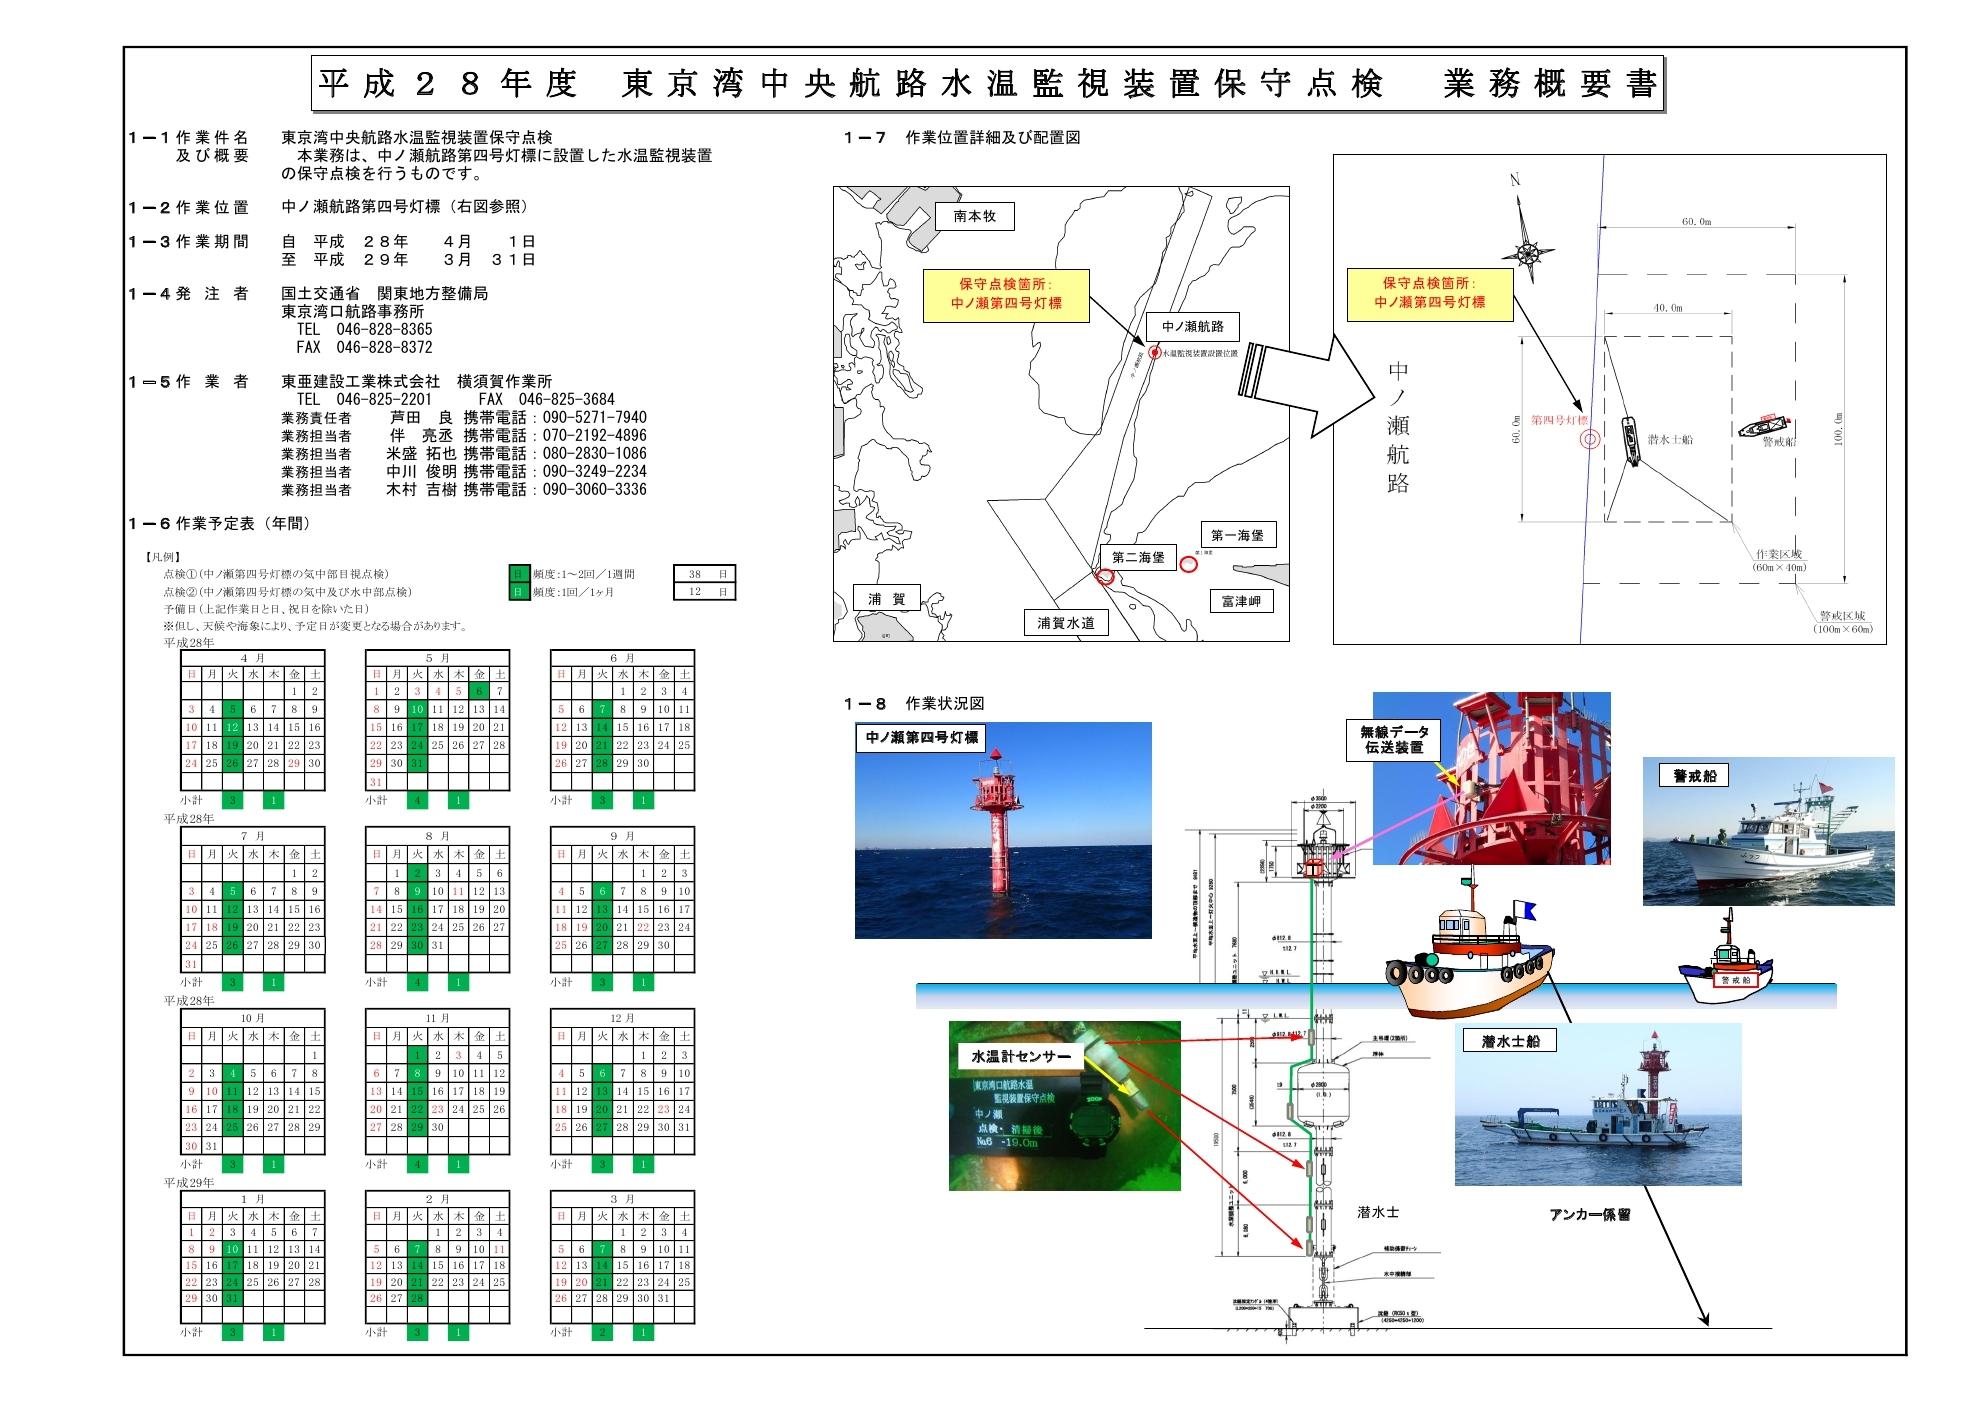 ★02-01業務概要書(中ノ瀬)H28.02.26.pdf_page_1